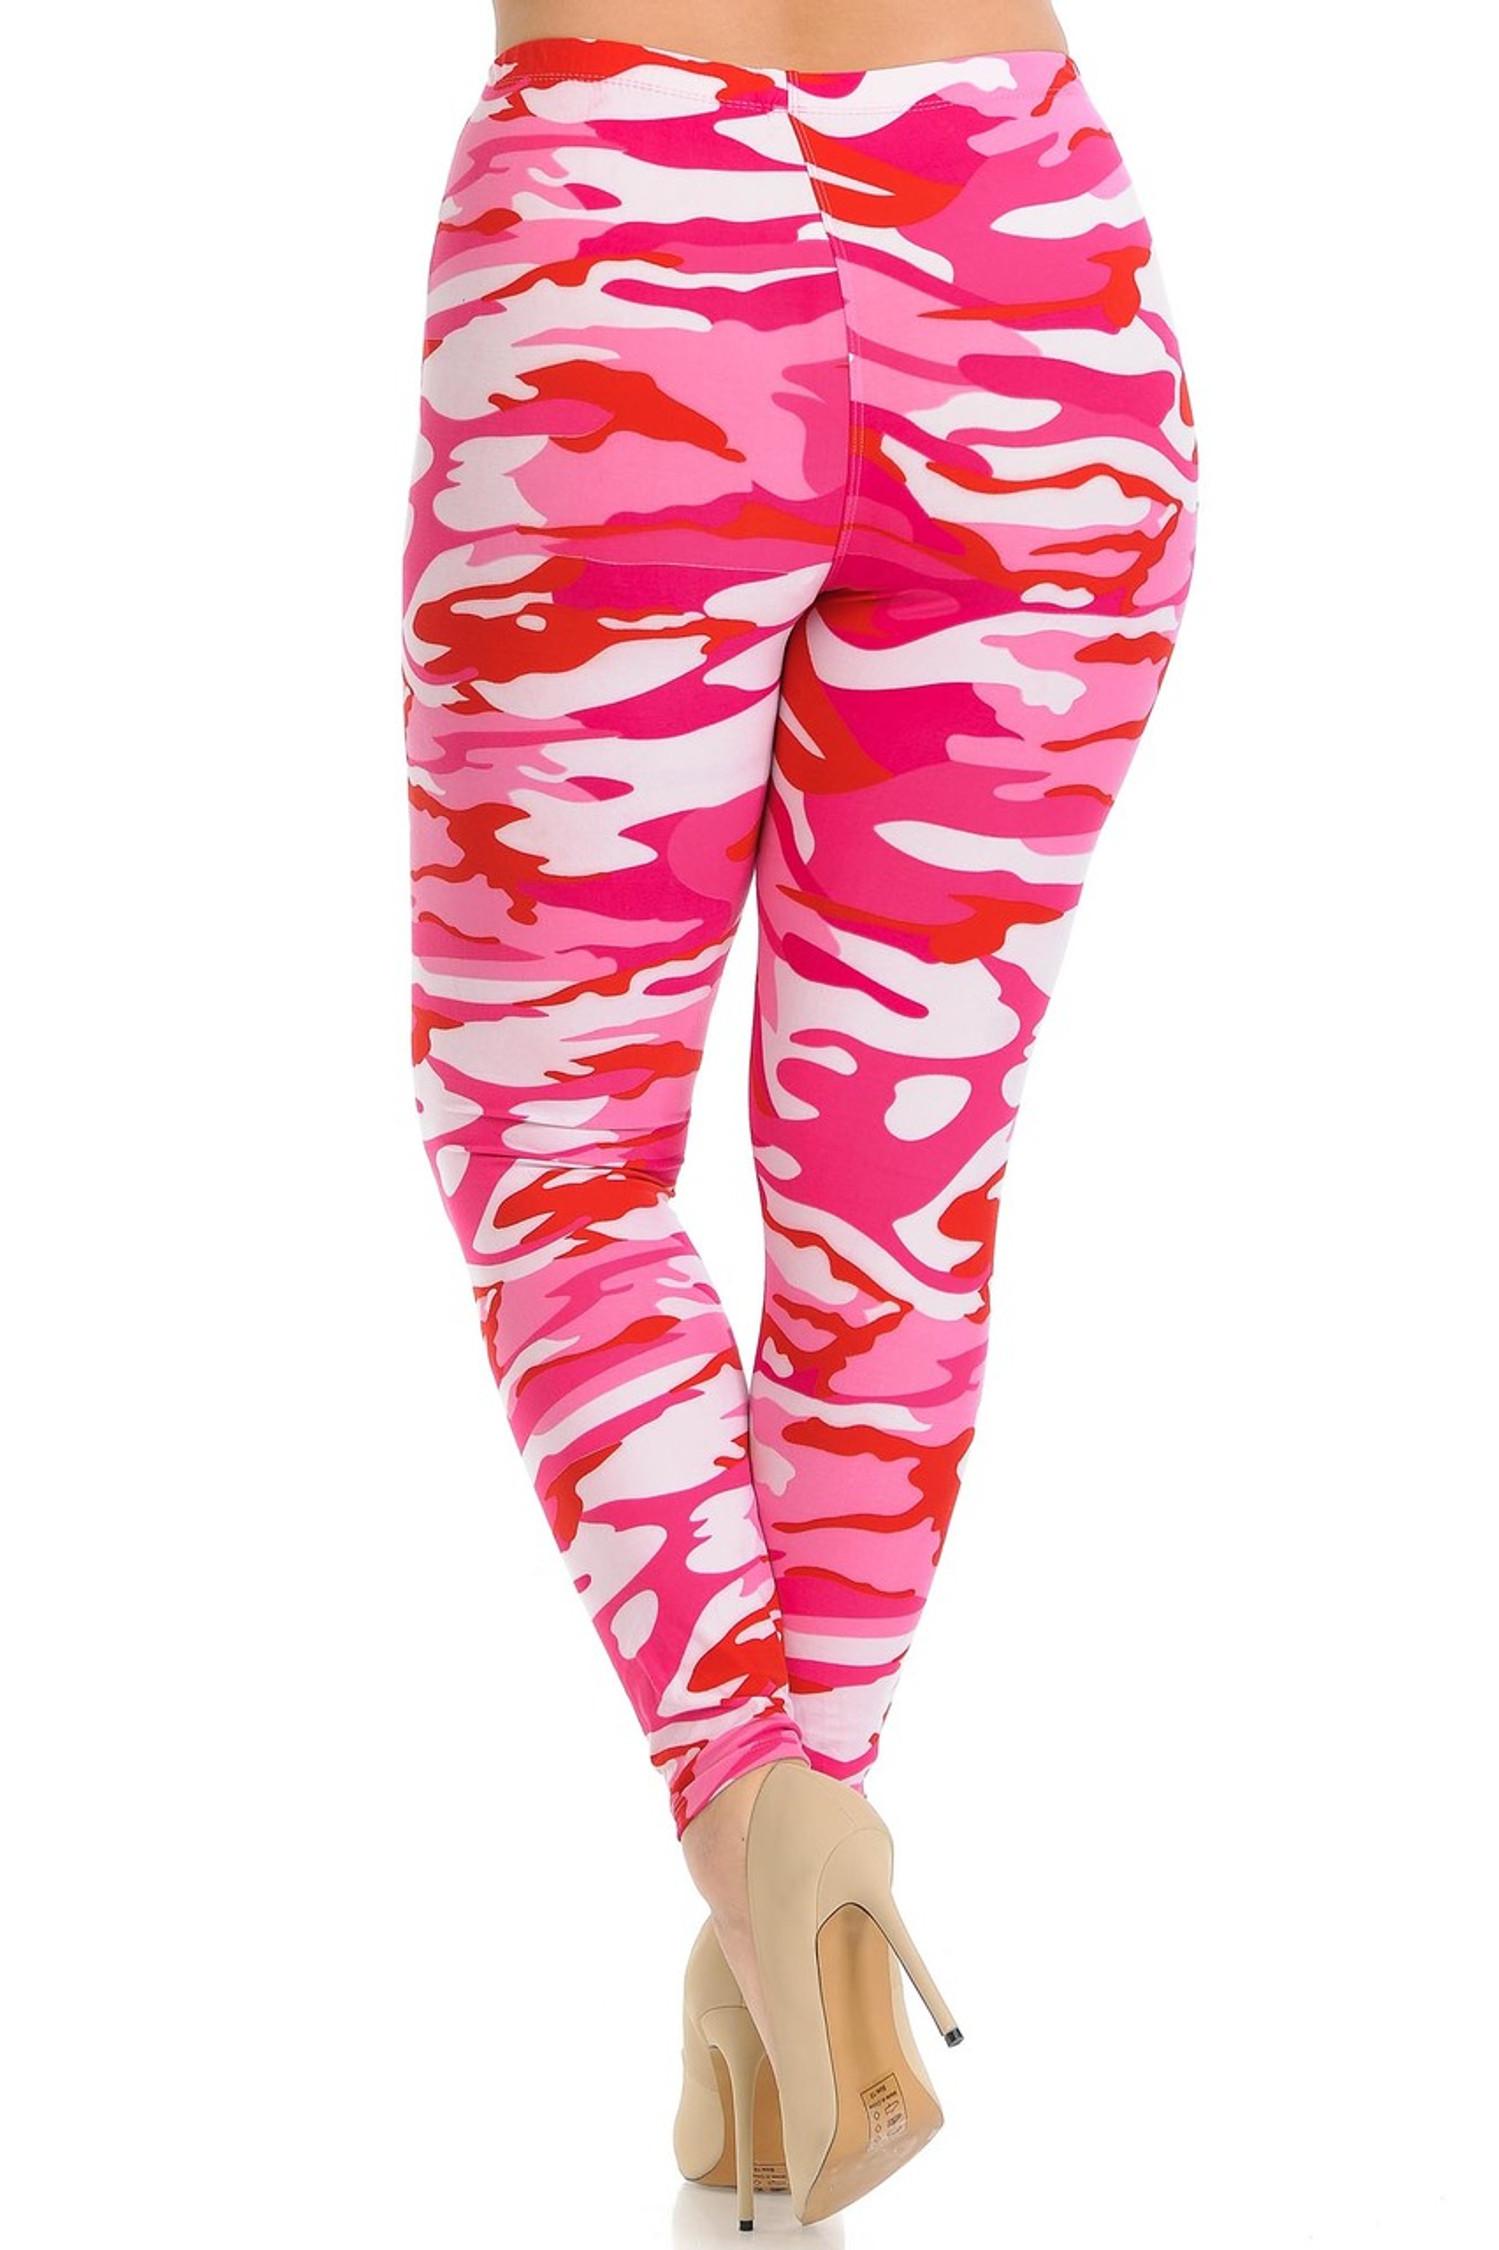 Brushed  Pink Camouflage Extra Plus Size Leggings - 3X-5X